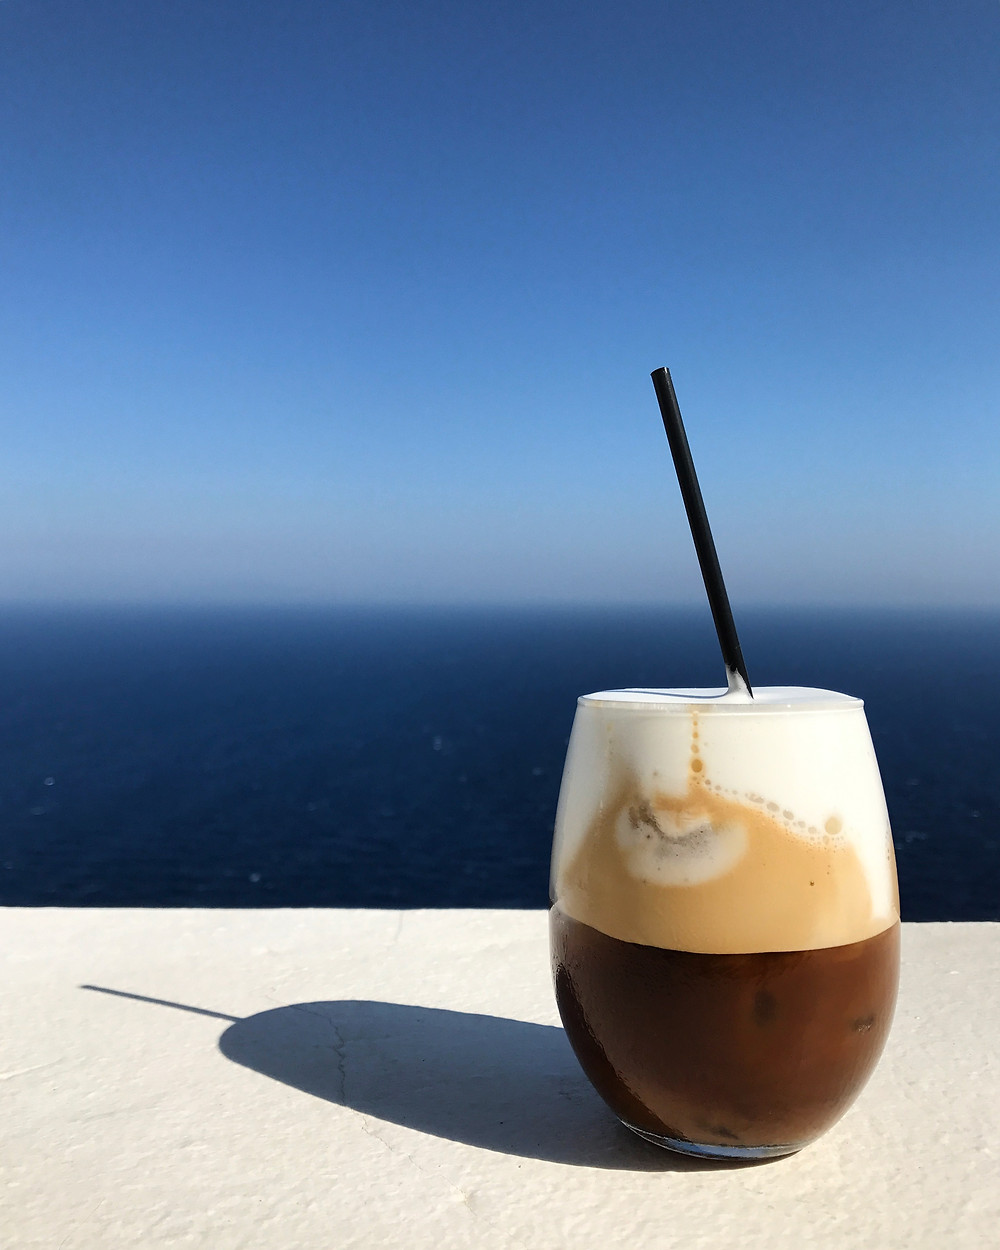 Freddo Cappuccino in Folegandros, Greece